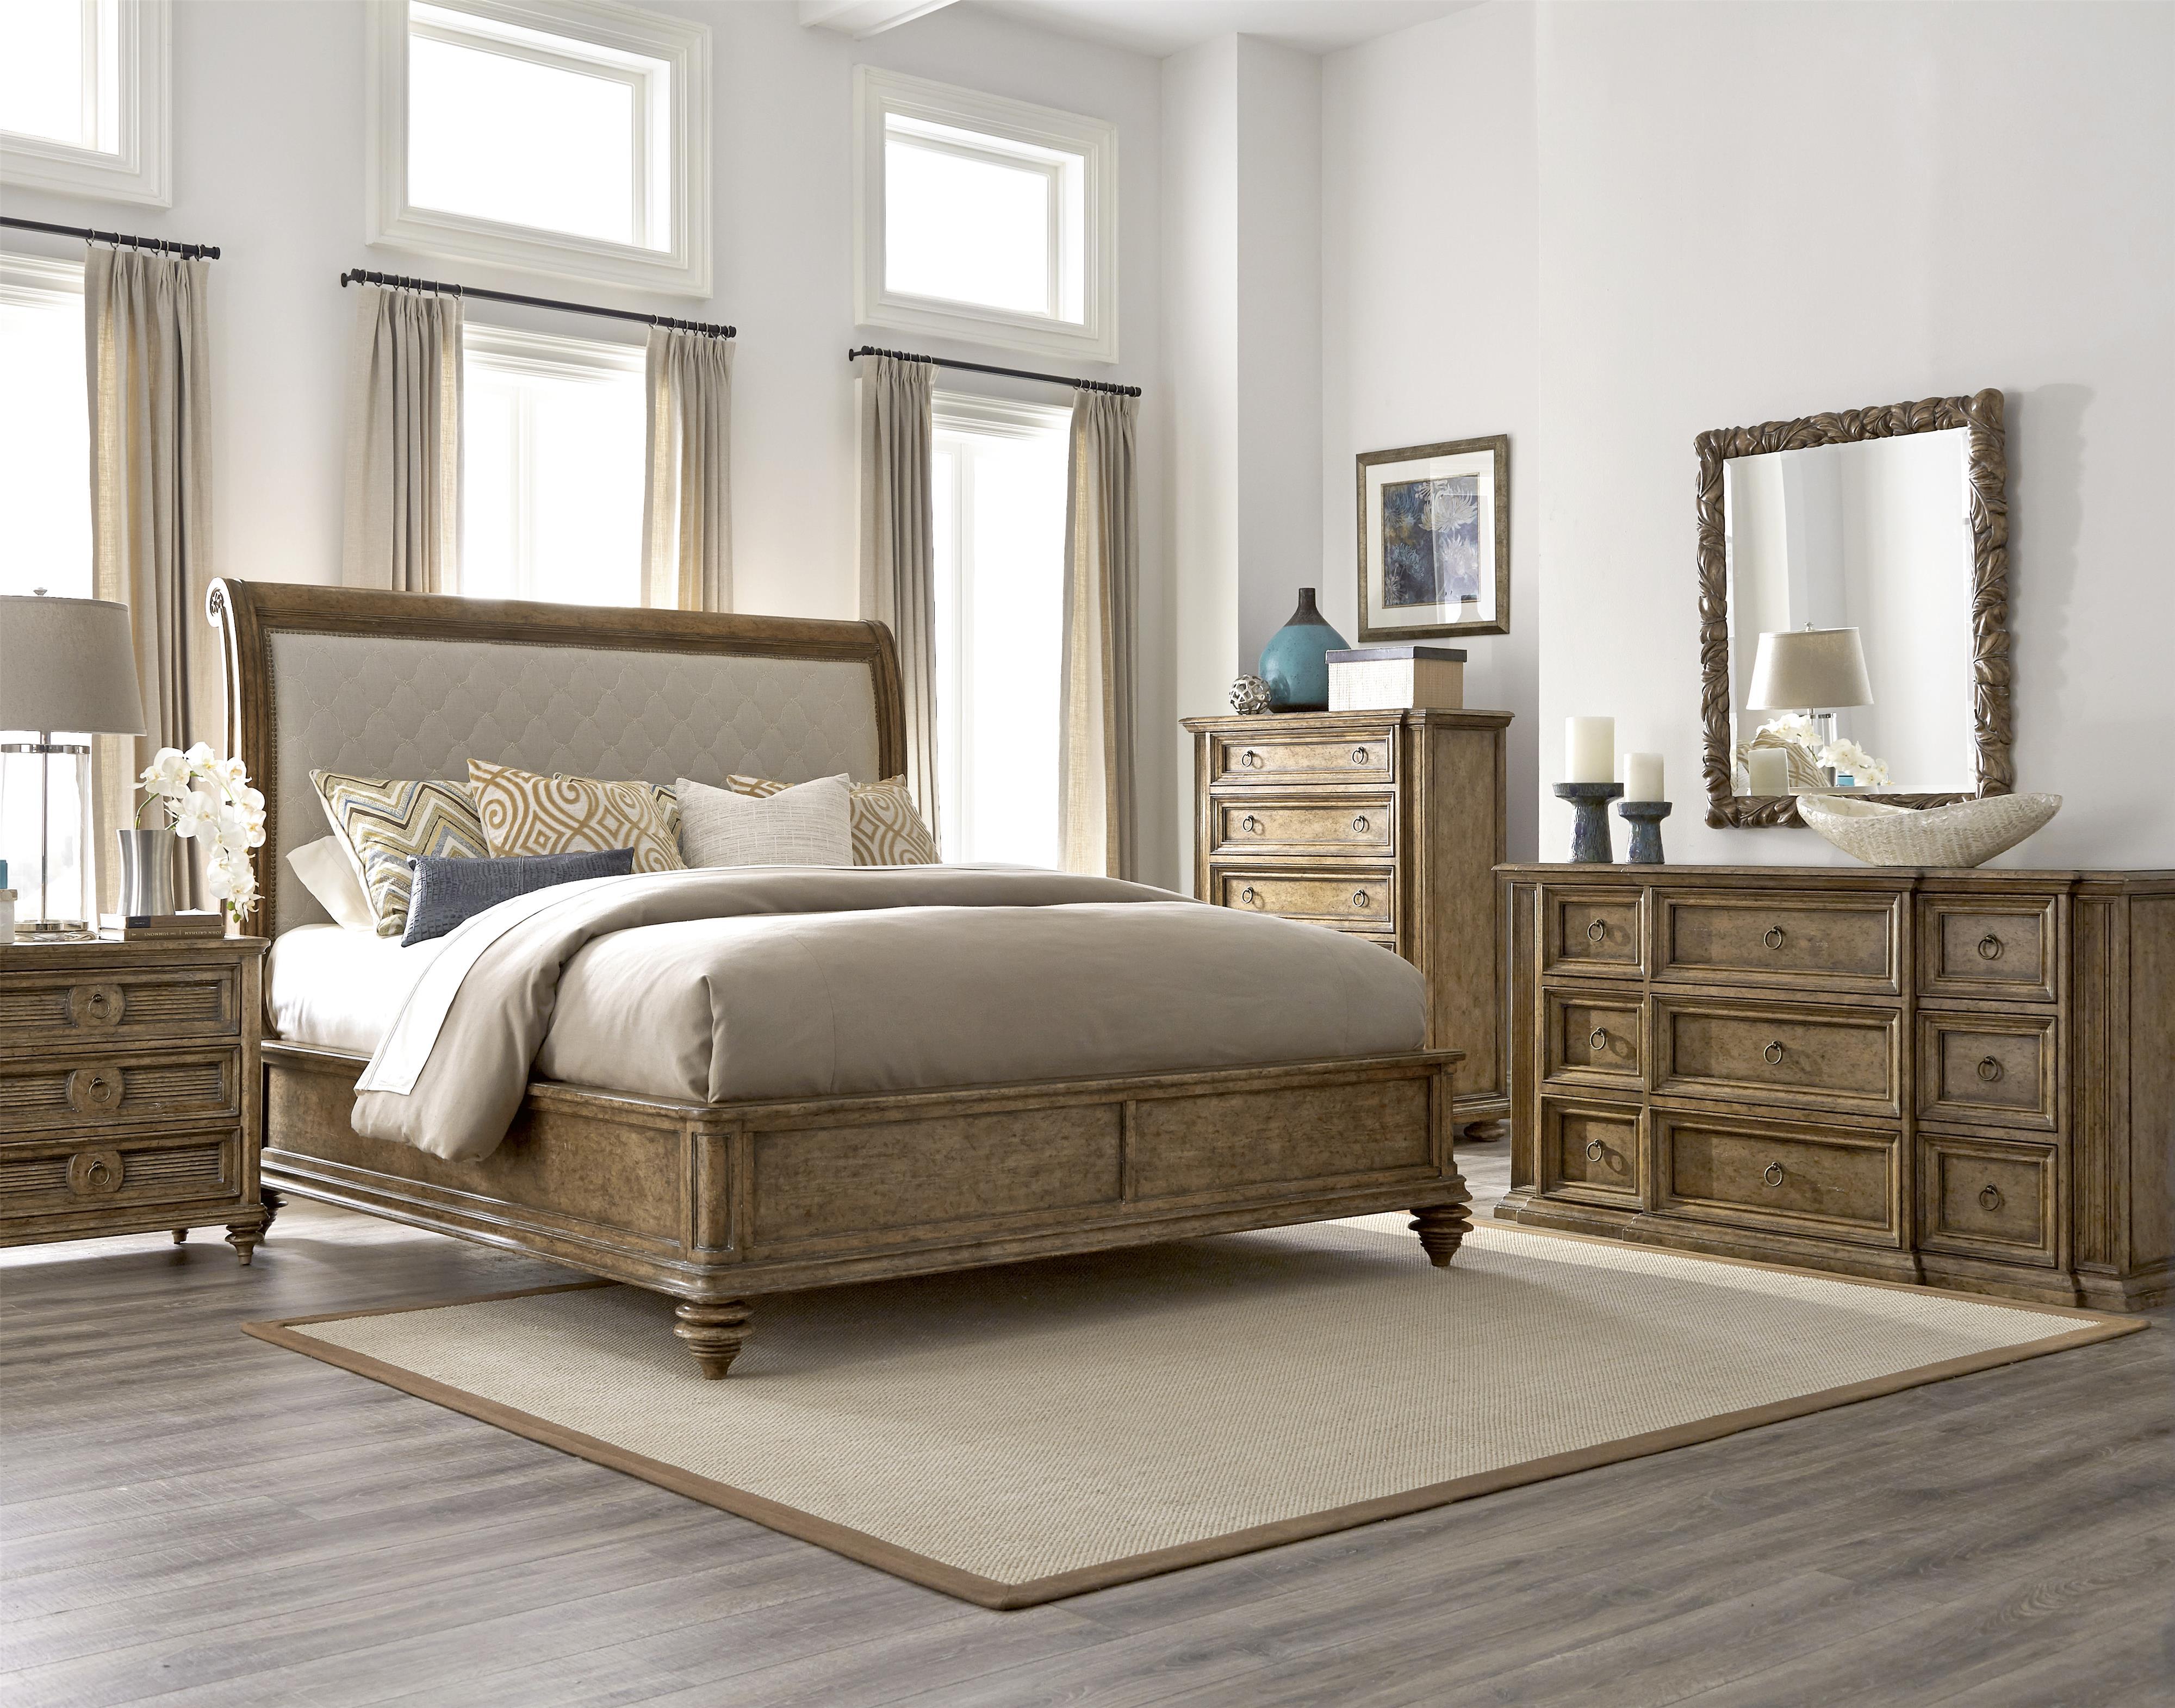 king upholstered sleigh bed